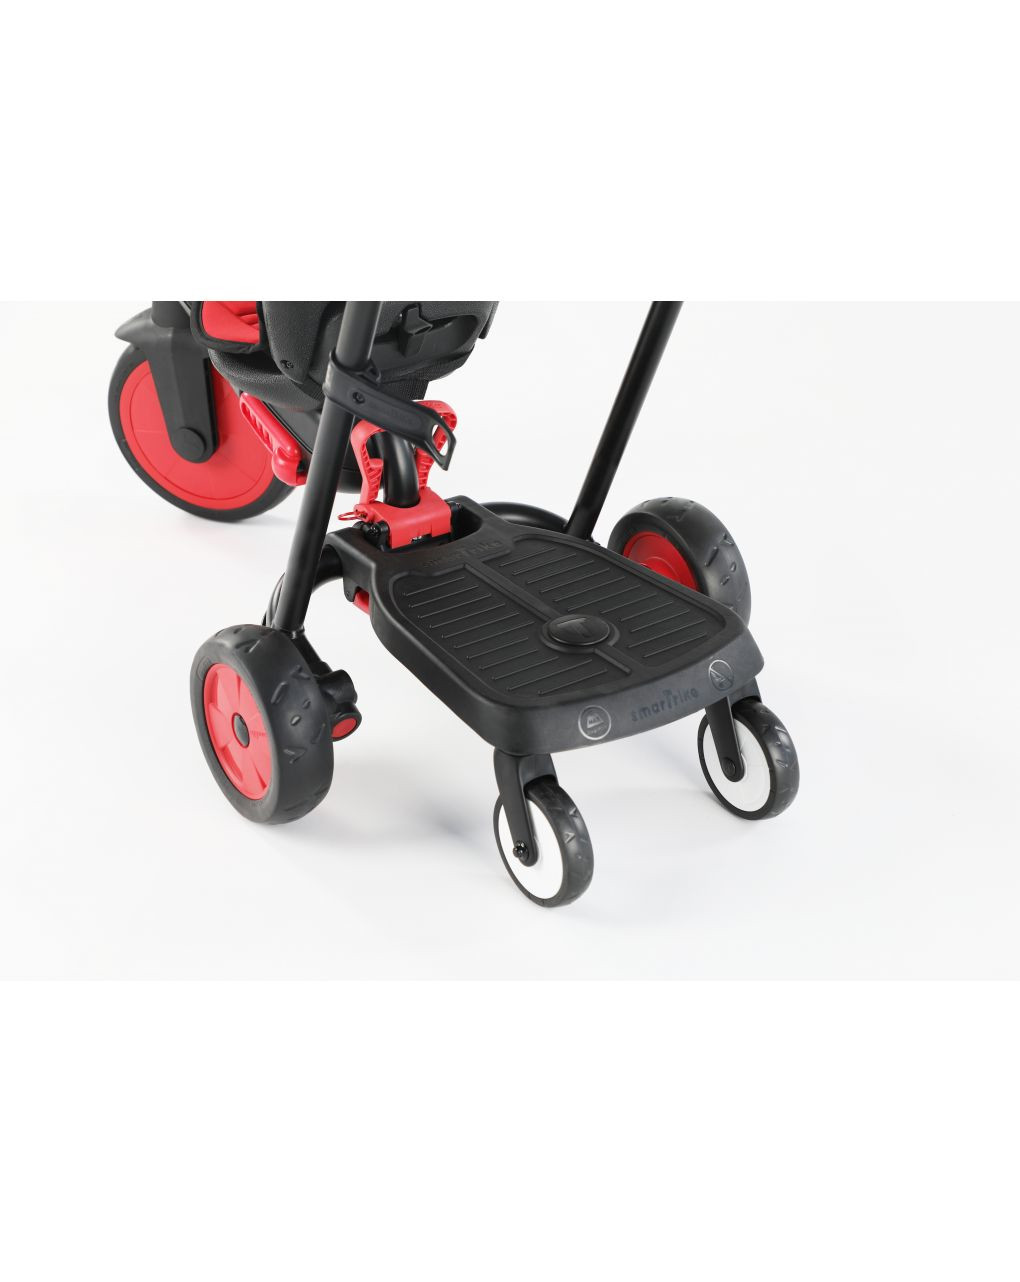 Smart trike - pedana buddy board - SmarTrike